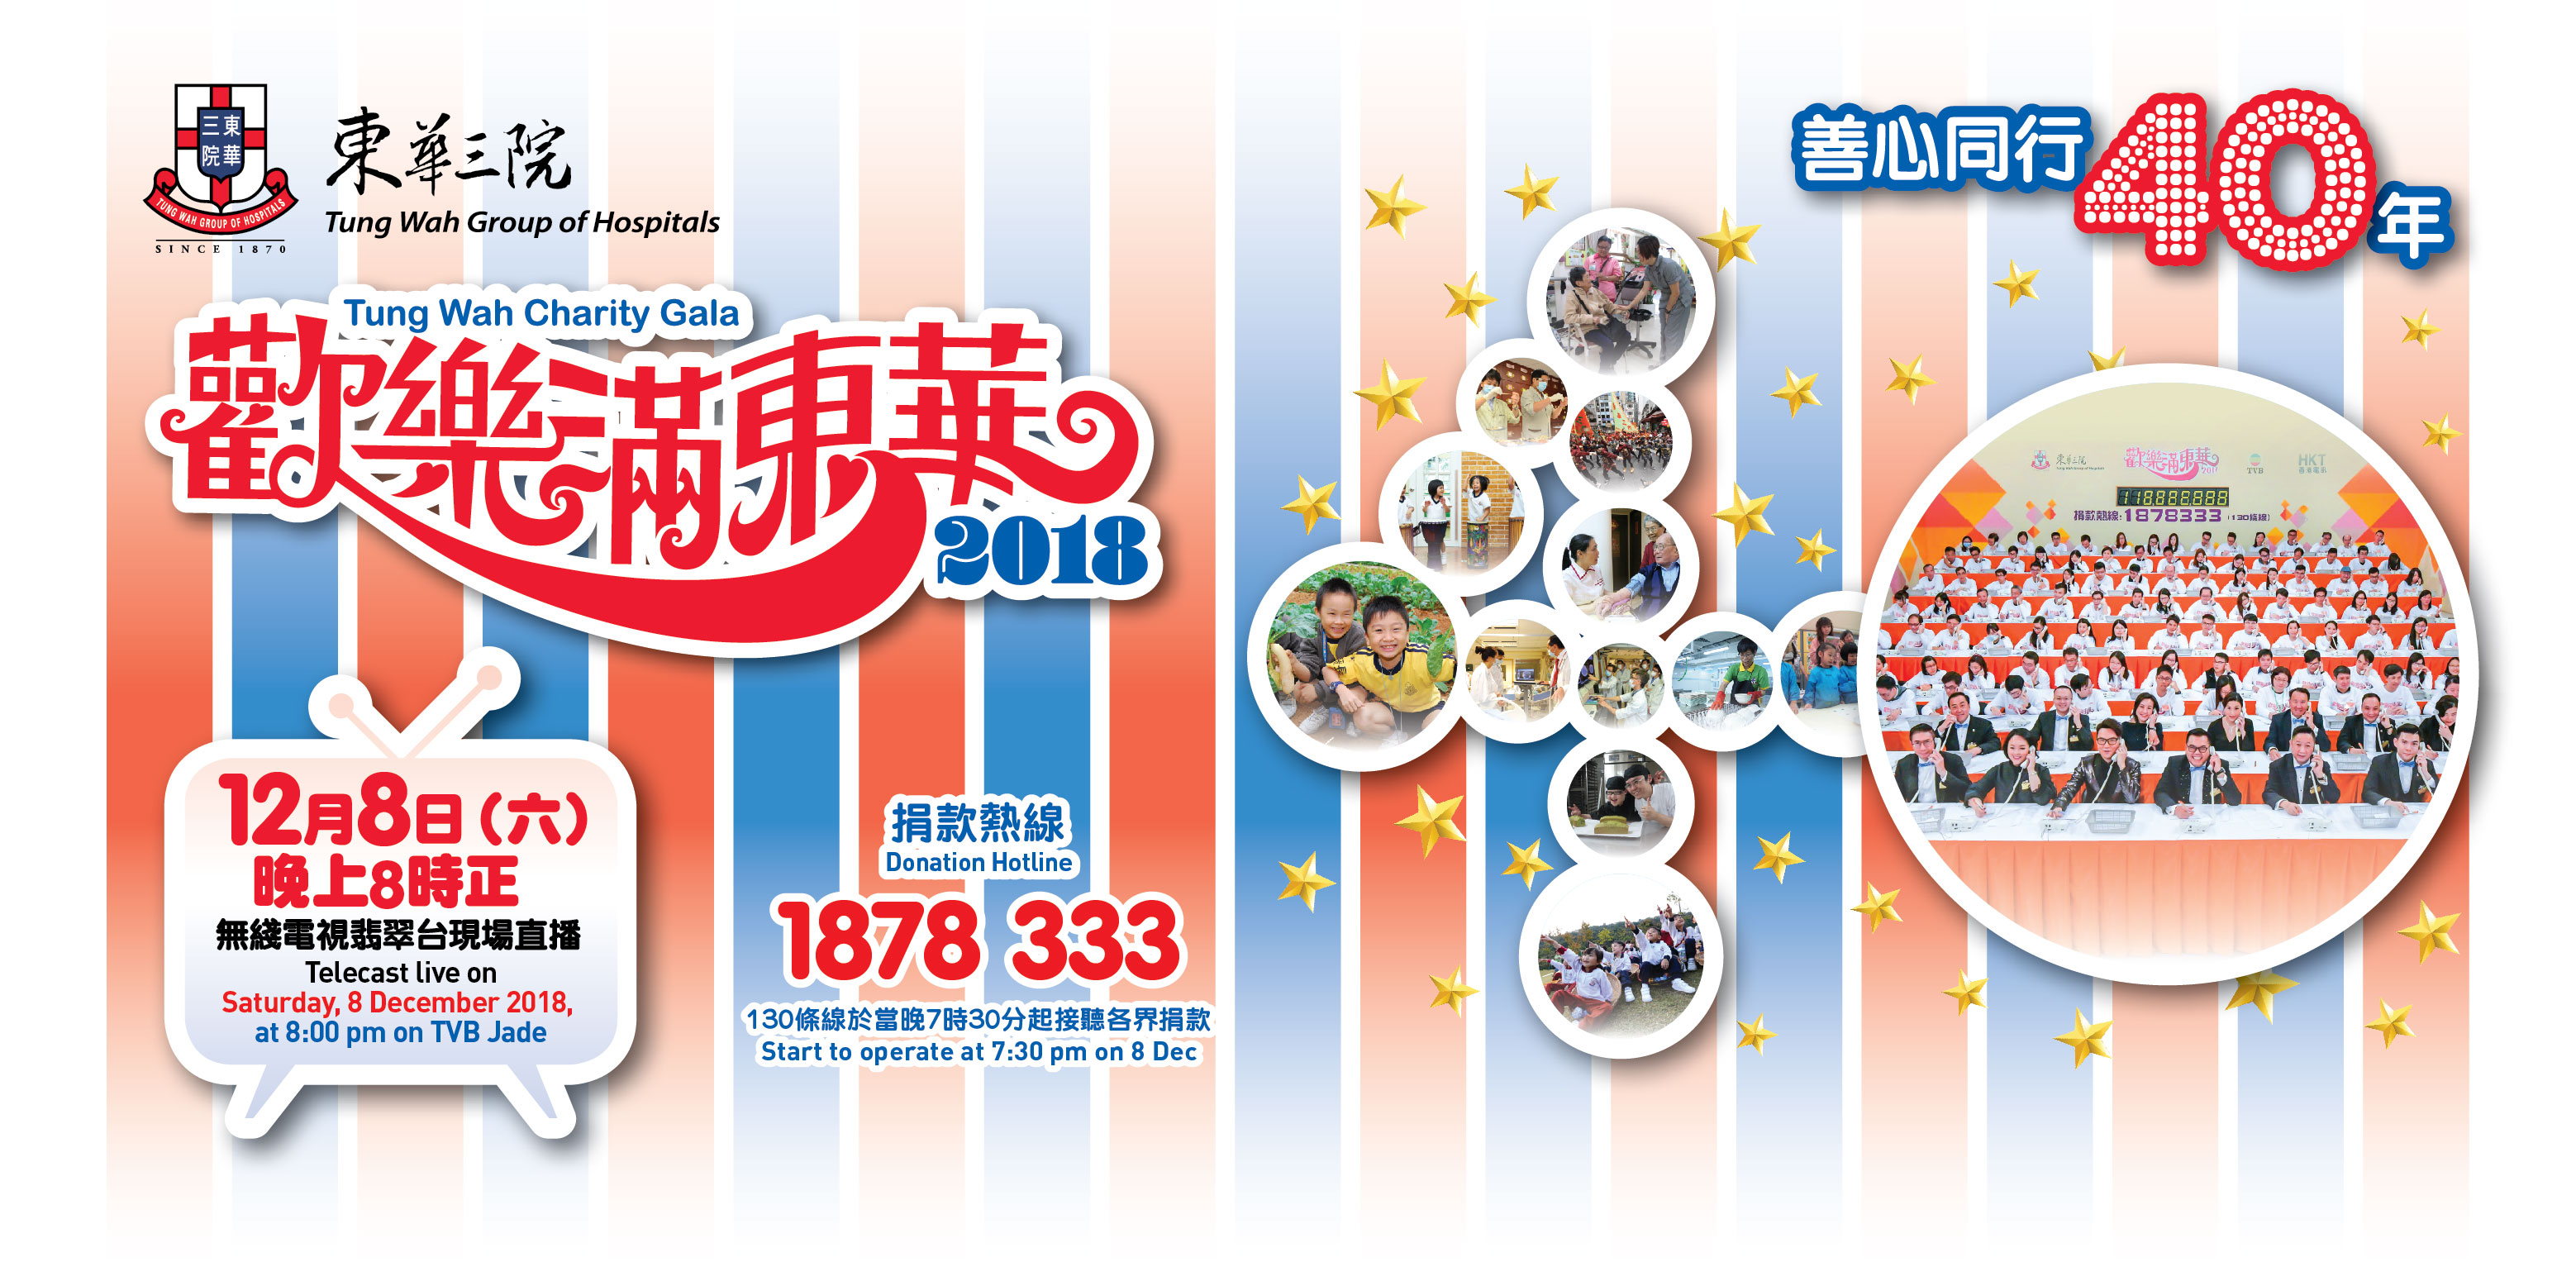 web banner 748x372p tc-01